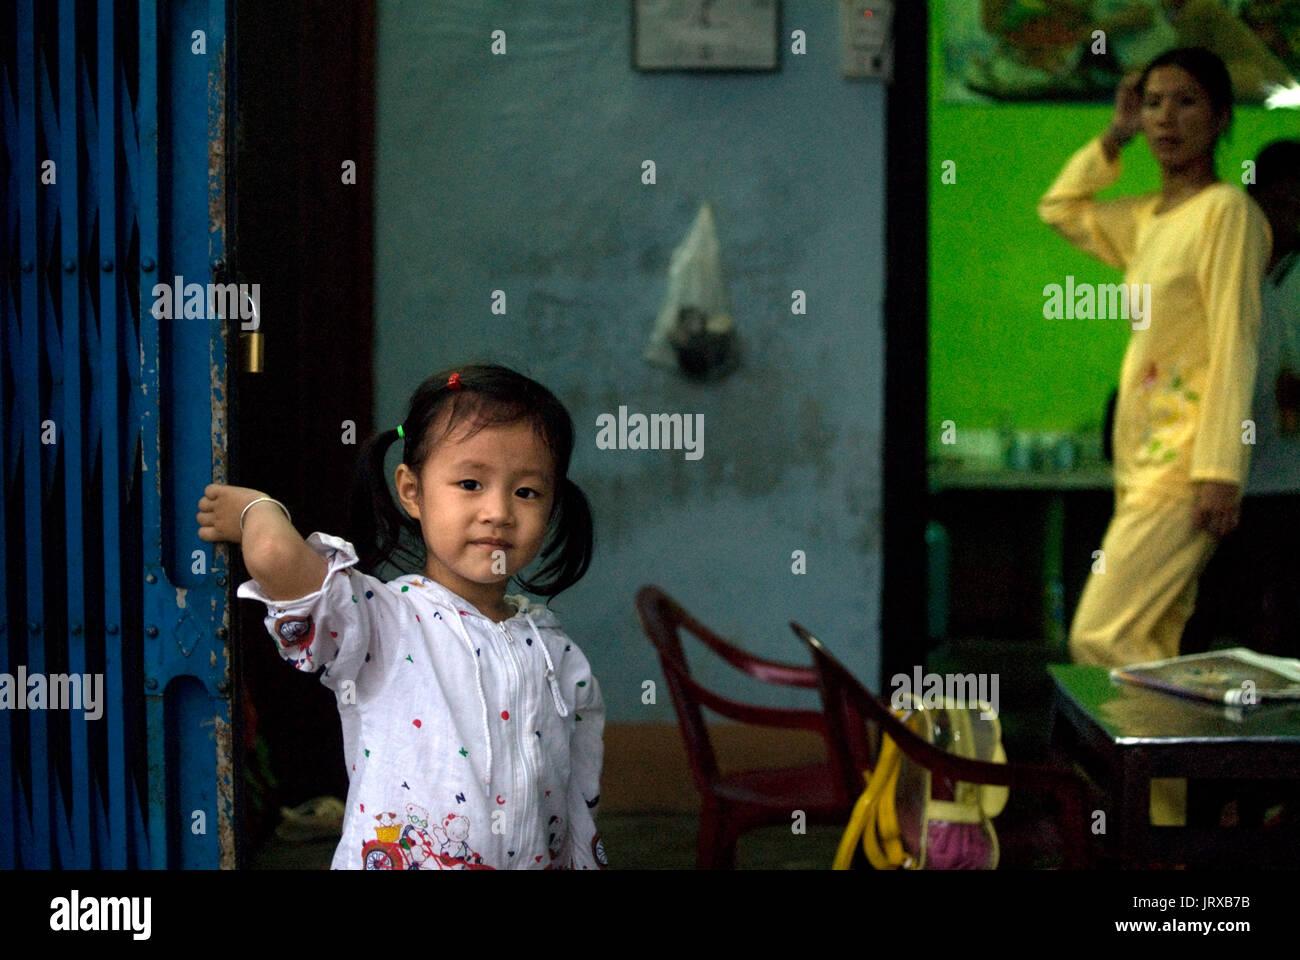 Coy smiling young girl inside a restaurant, Hue, Vietnam, Southeast Asia - Stock Image